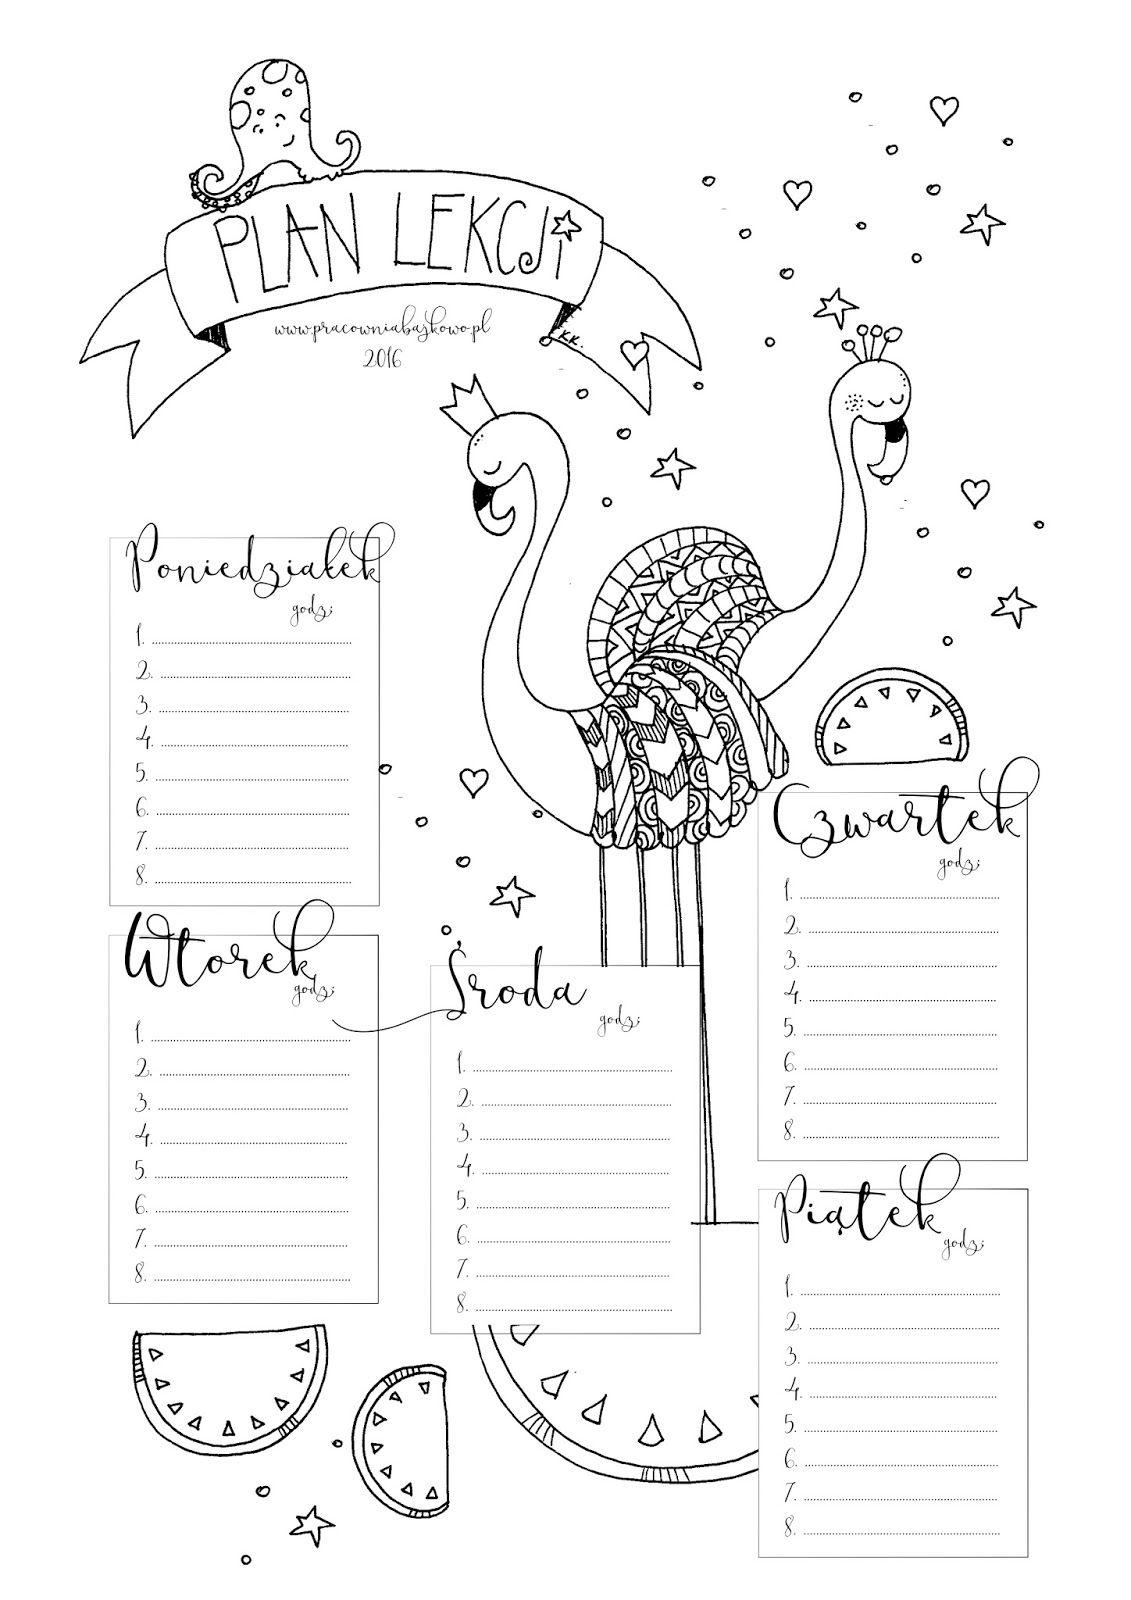 Pin By Ania On Wychowanie School Plan School Timetable School Planner